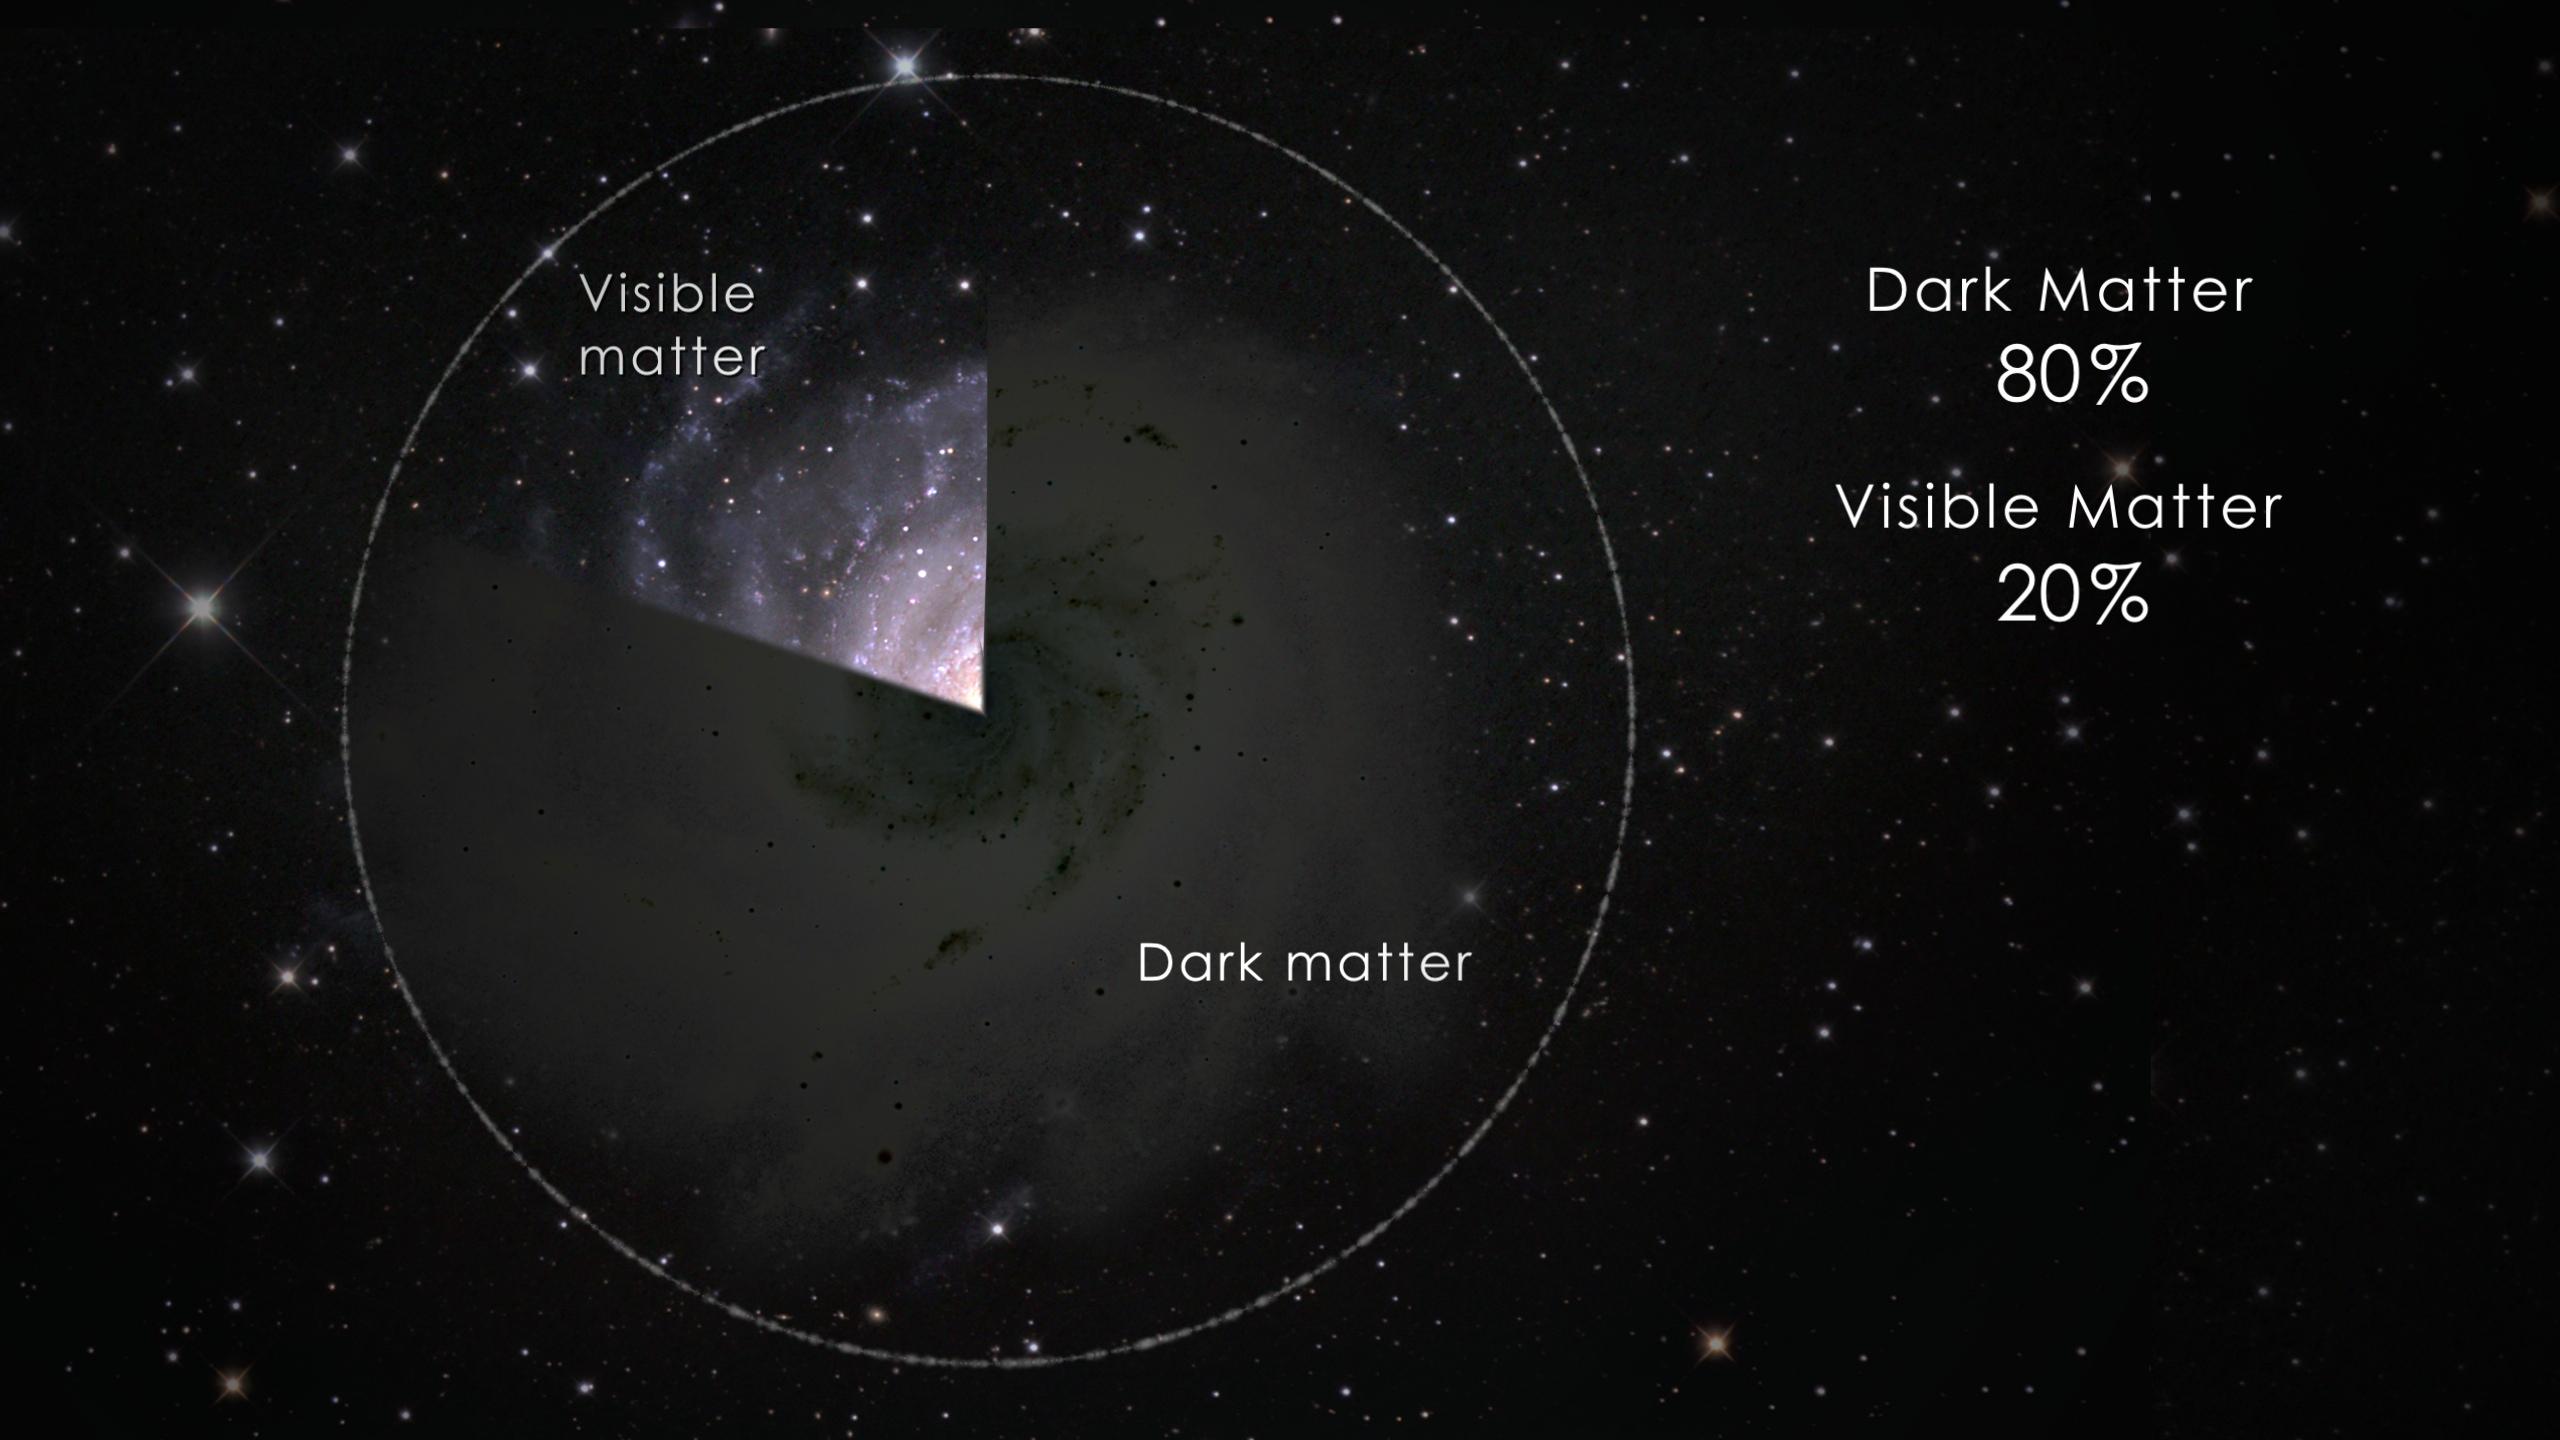 nasa galaxy chart - photo #14